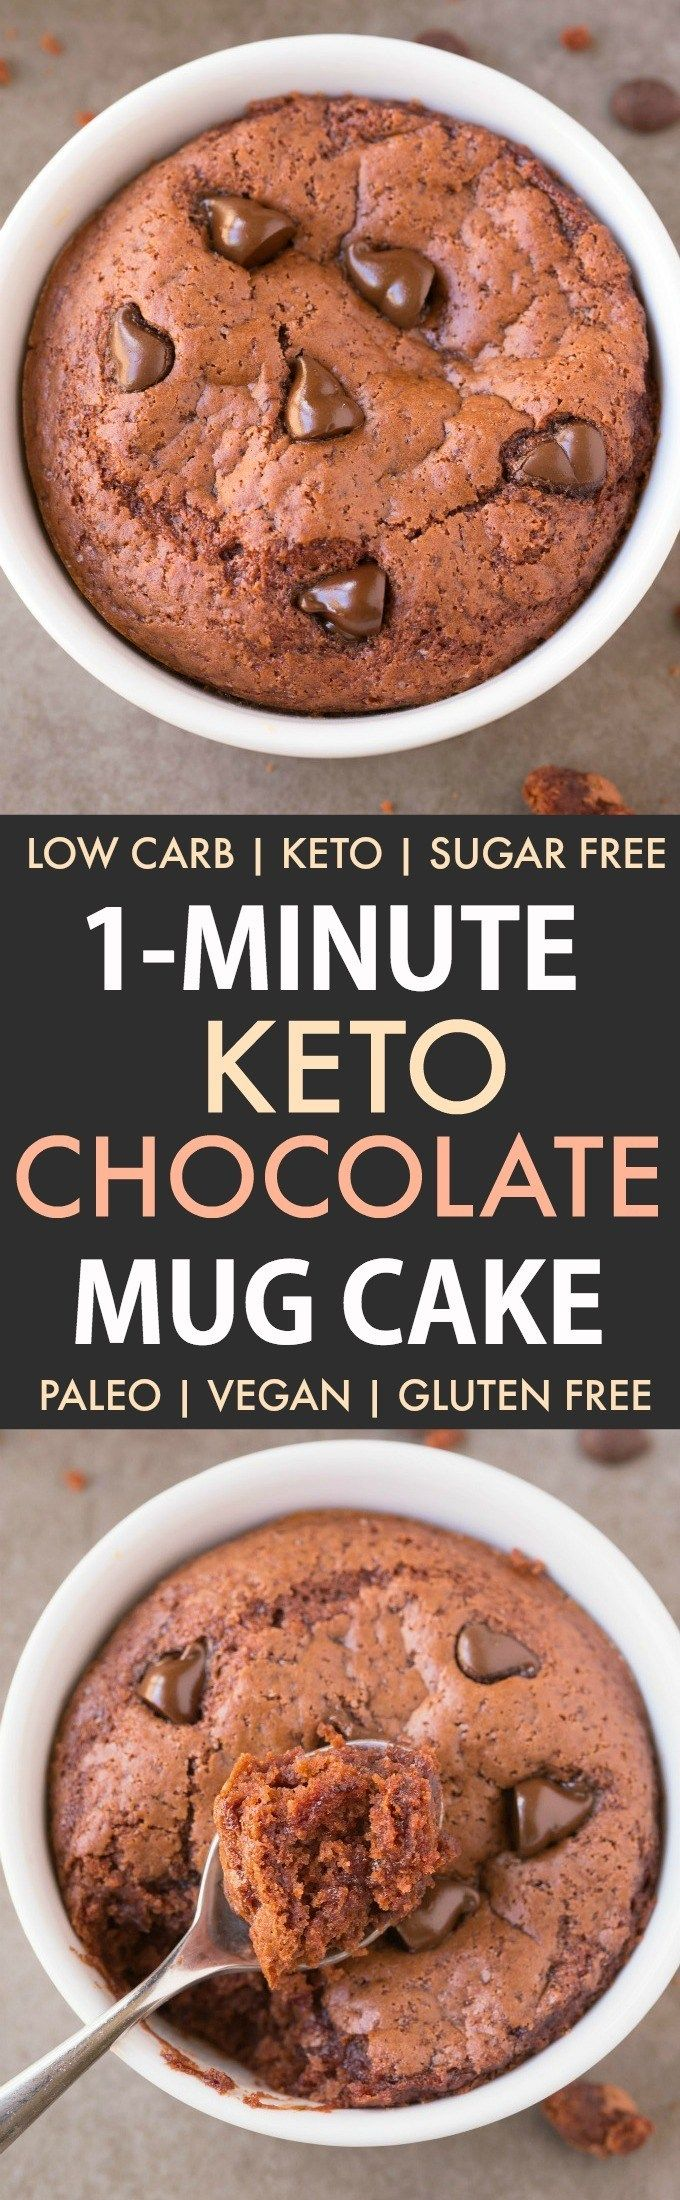 1-Minute Keto Chocolate Mug Cake (Paleo, Vegan, Sugar Free ...